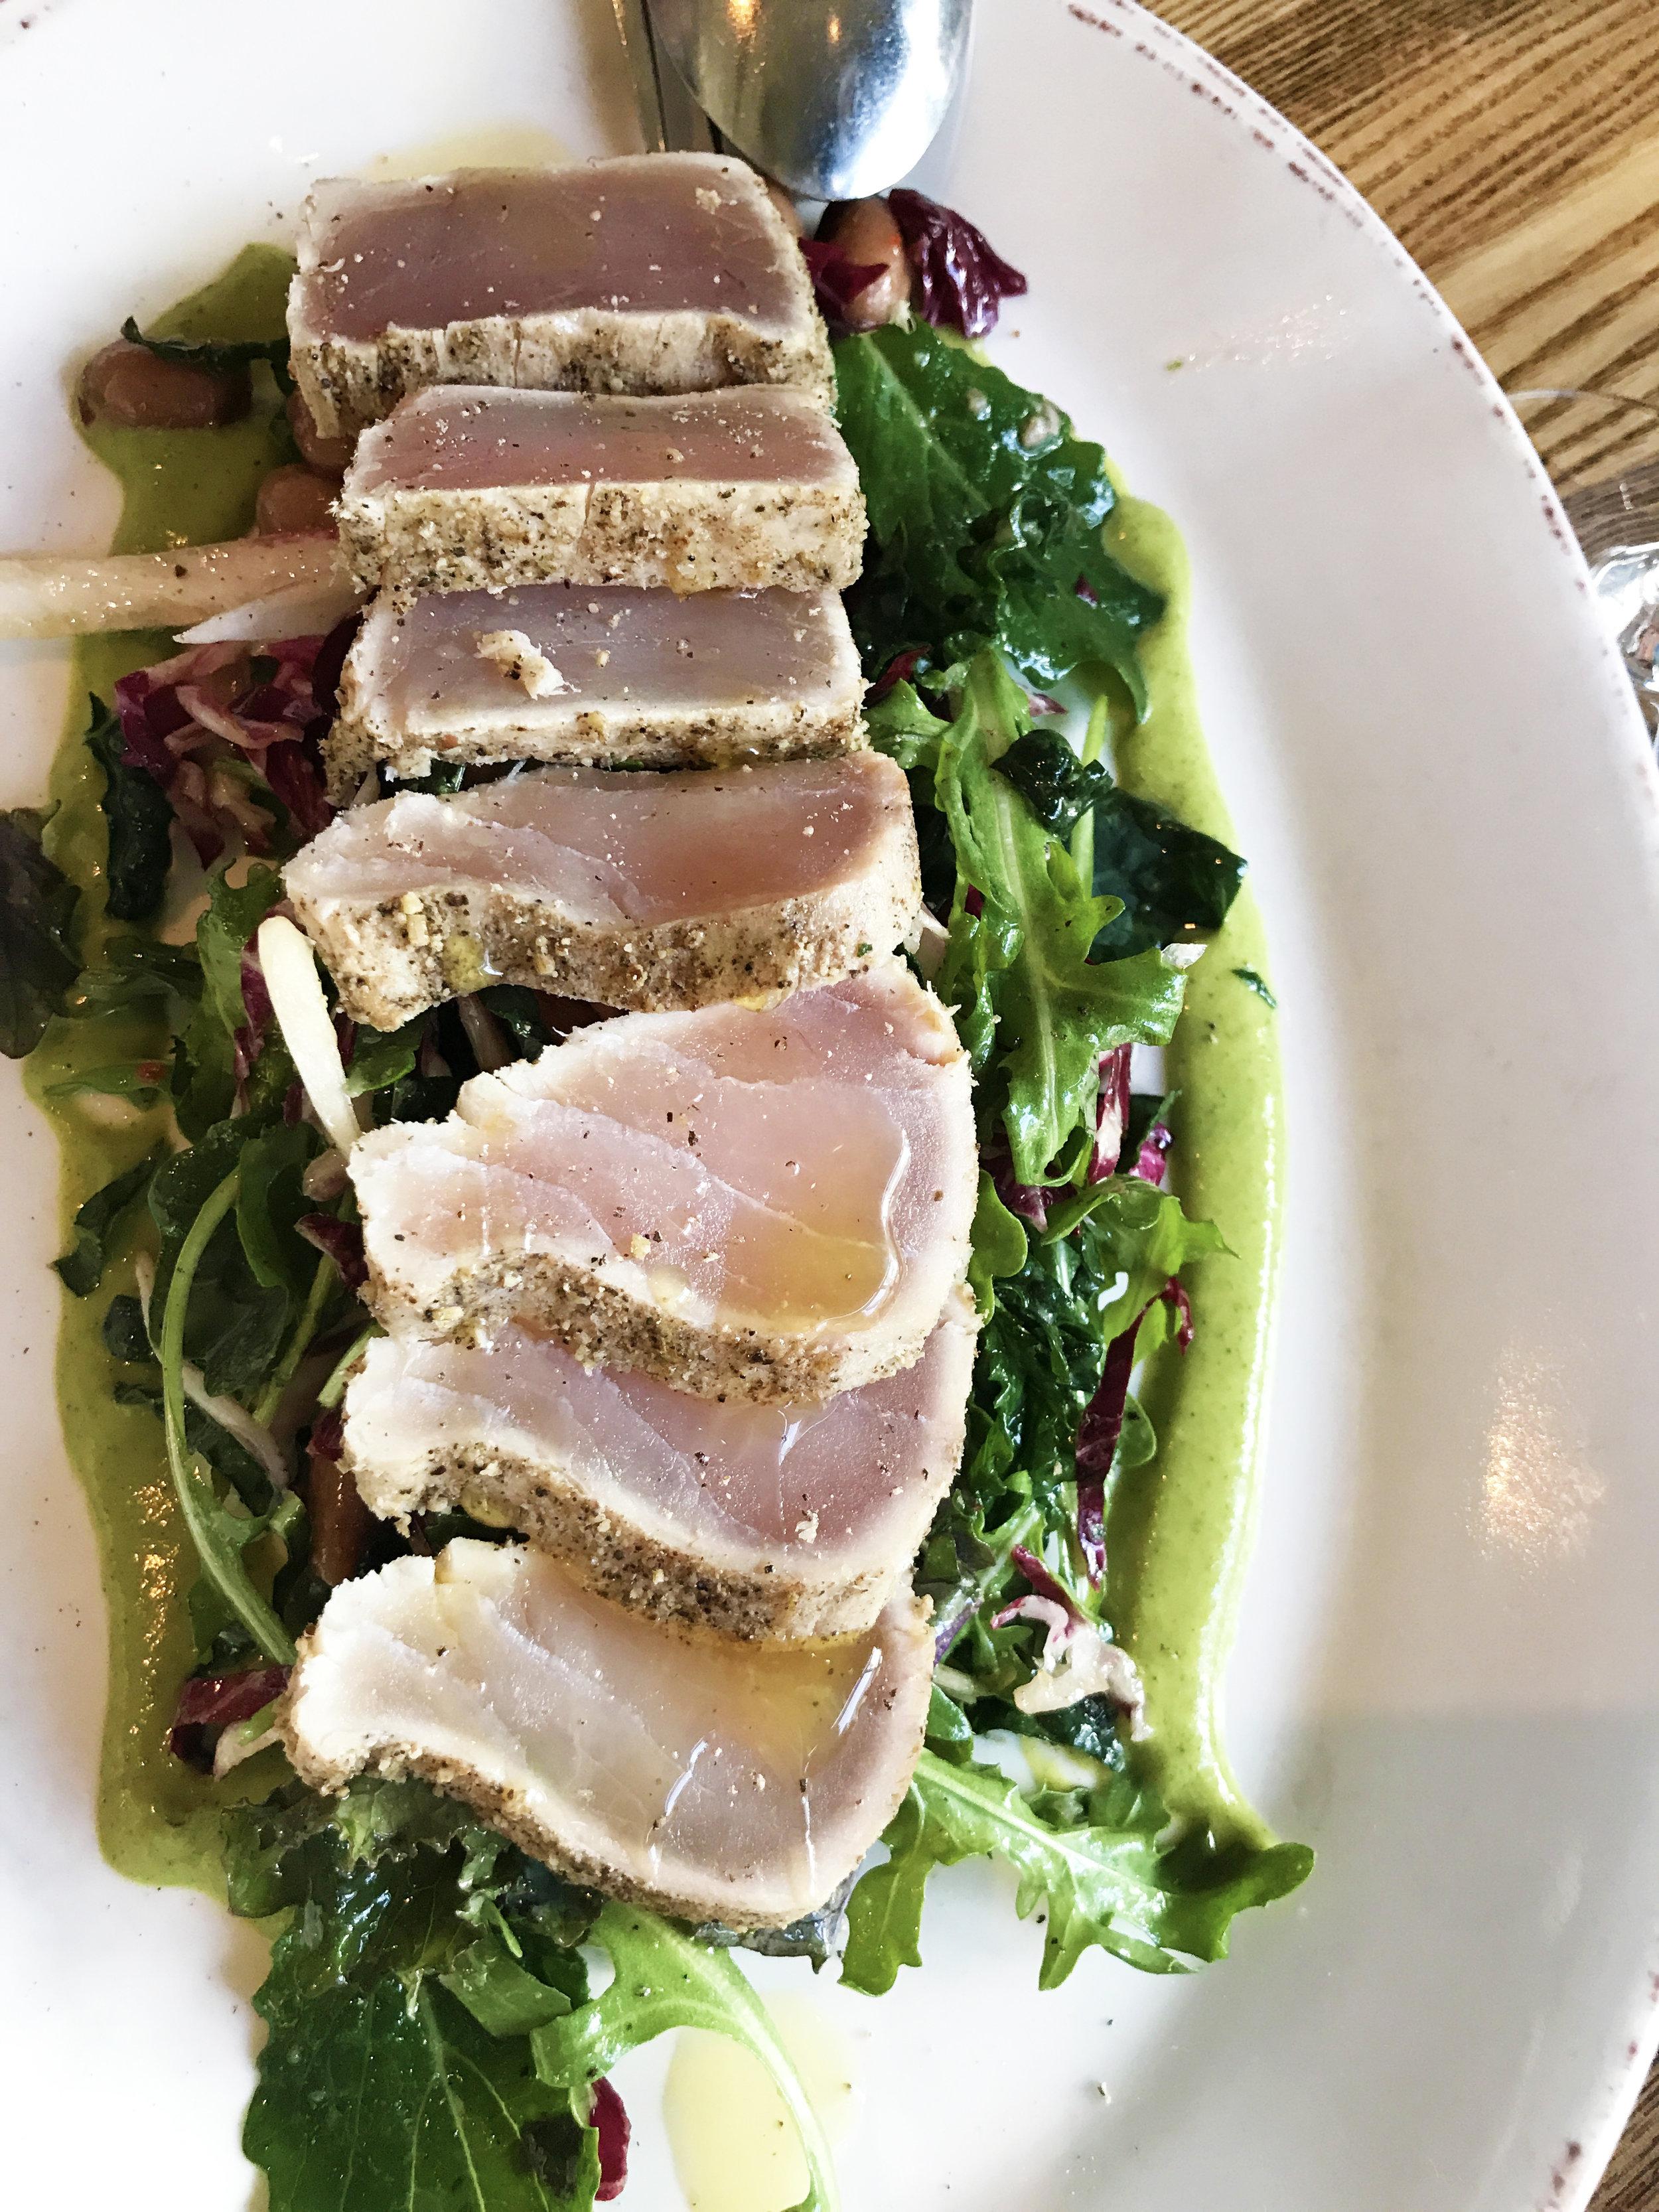 Tonnetto - seared albacore tuna, arugula, radicchio, marinated borlotti beans, green garlic coulis